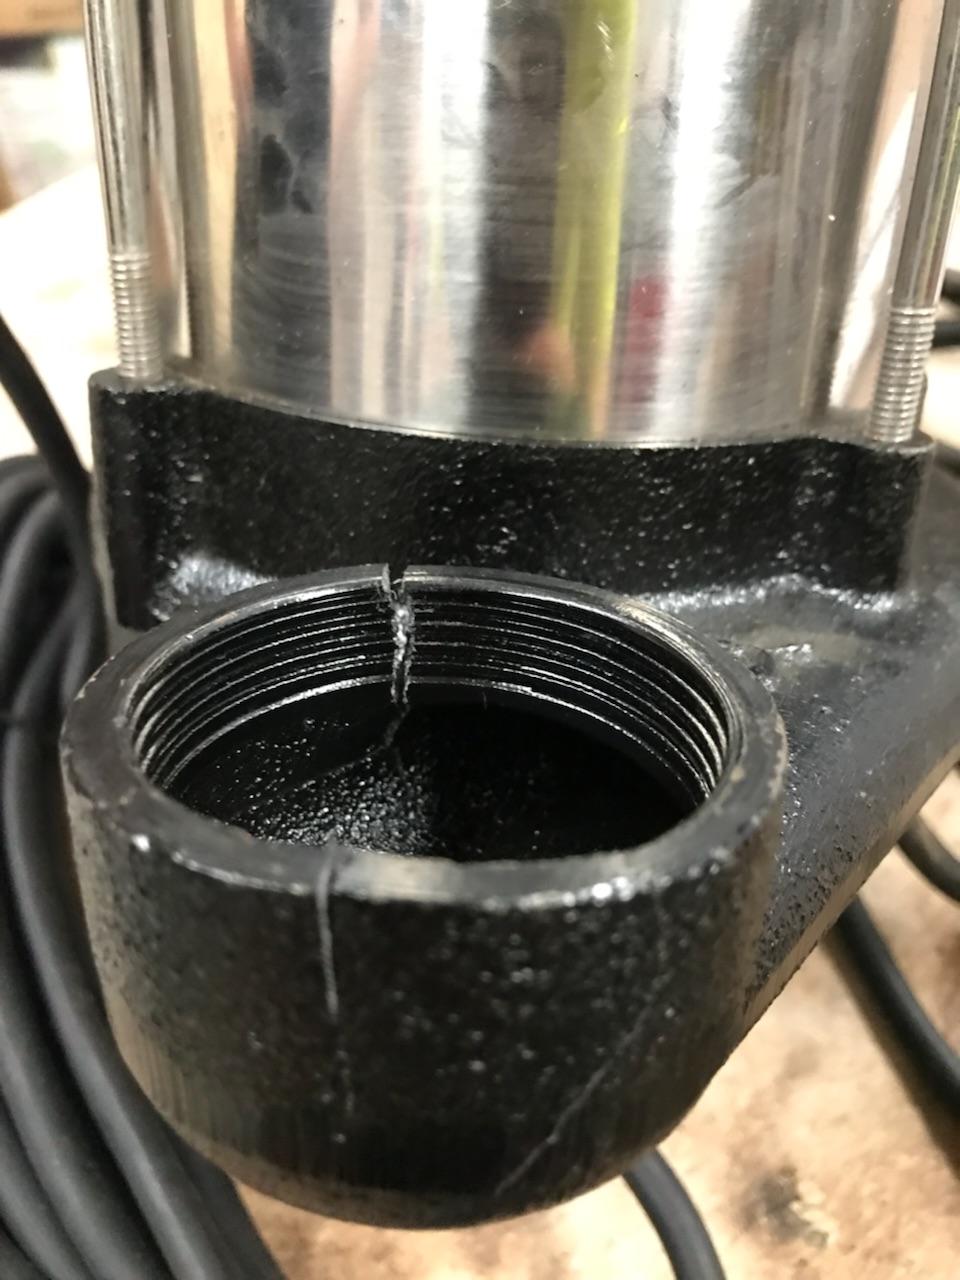 Cracked pump